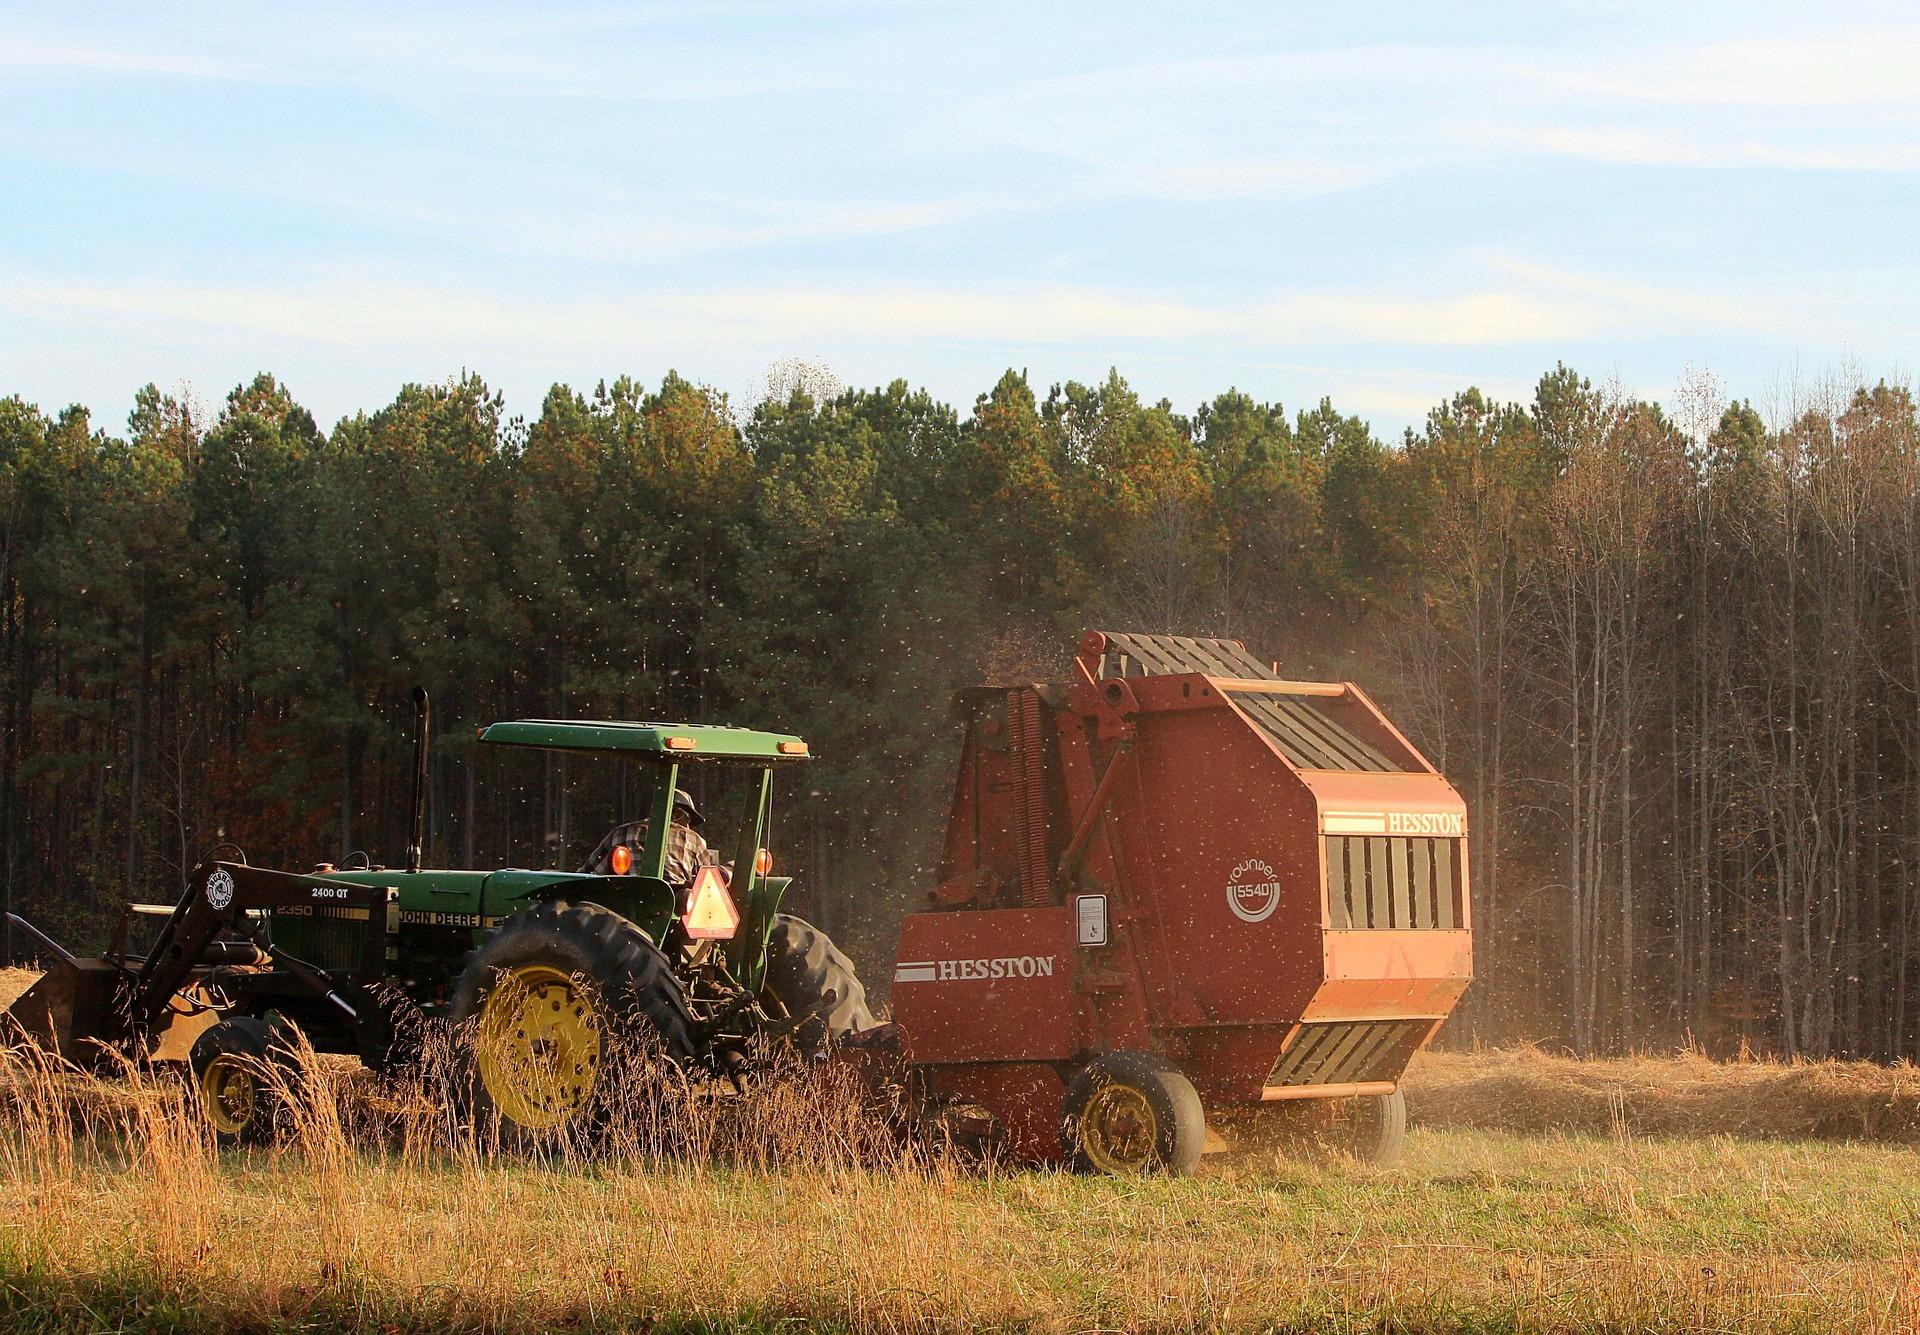 tractor-65765_1920.jpg